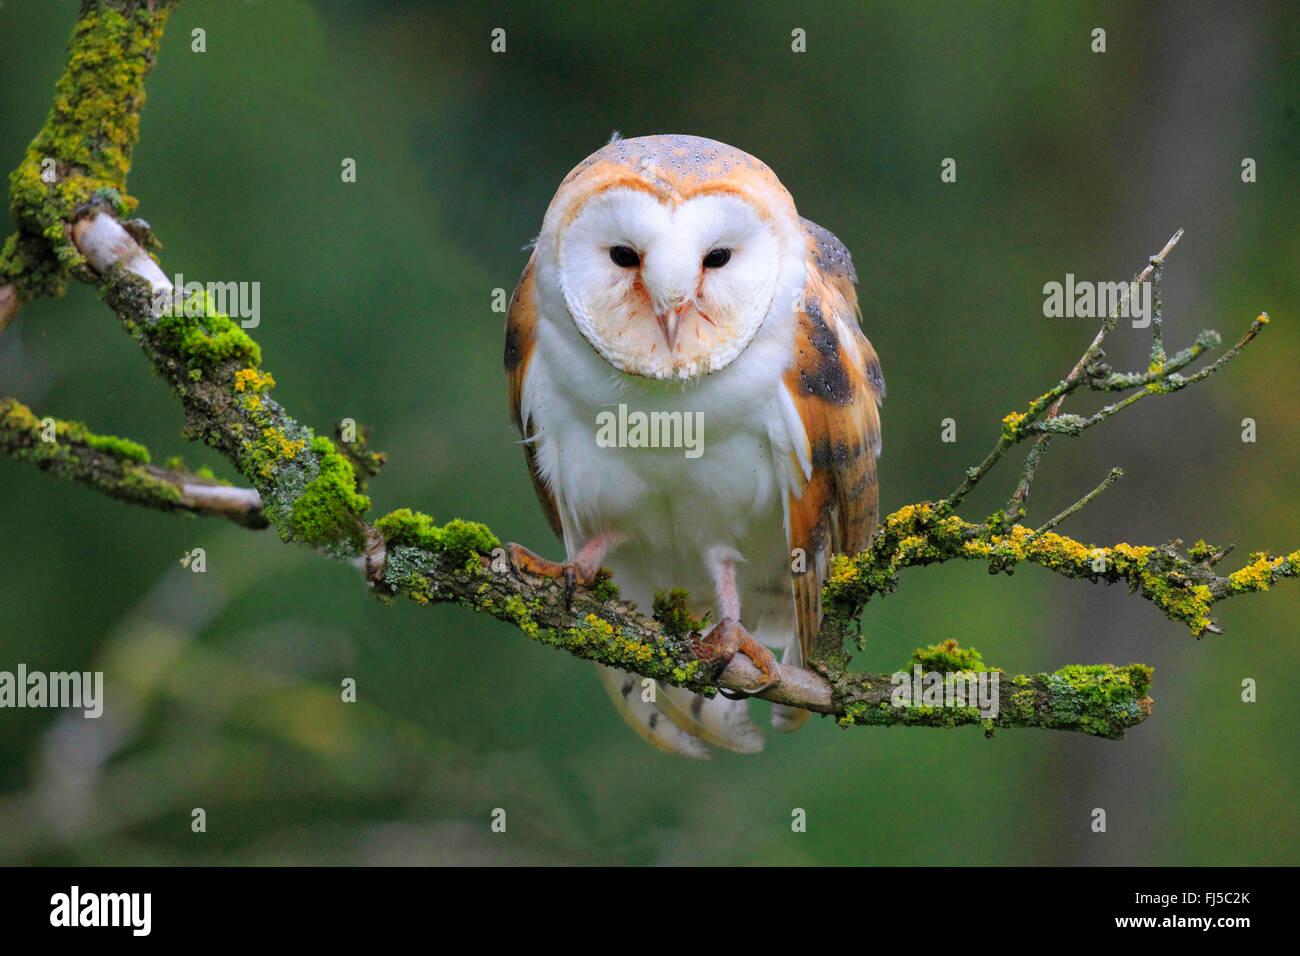 Barn owl (Tyto alba), sitting on a branch, Germany - Stock Image